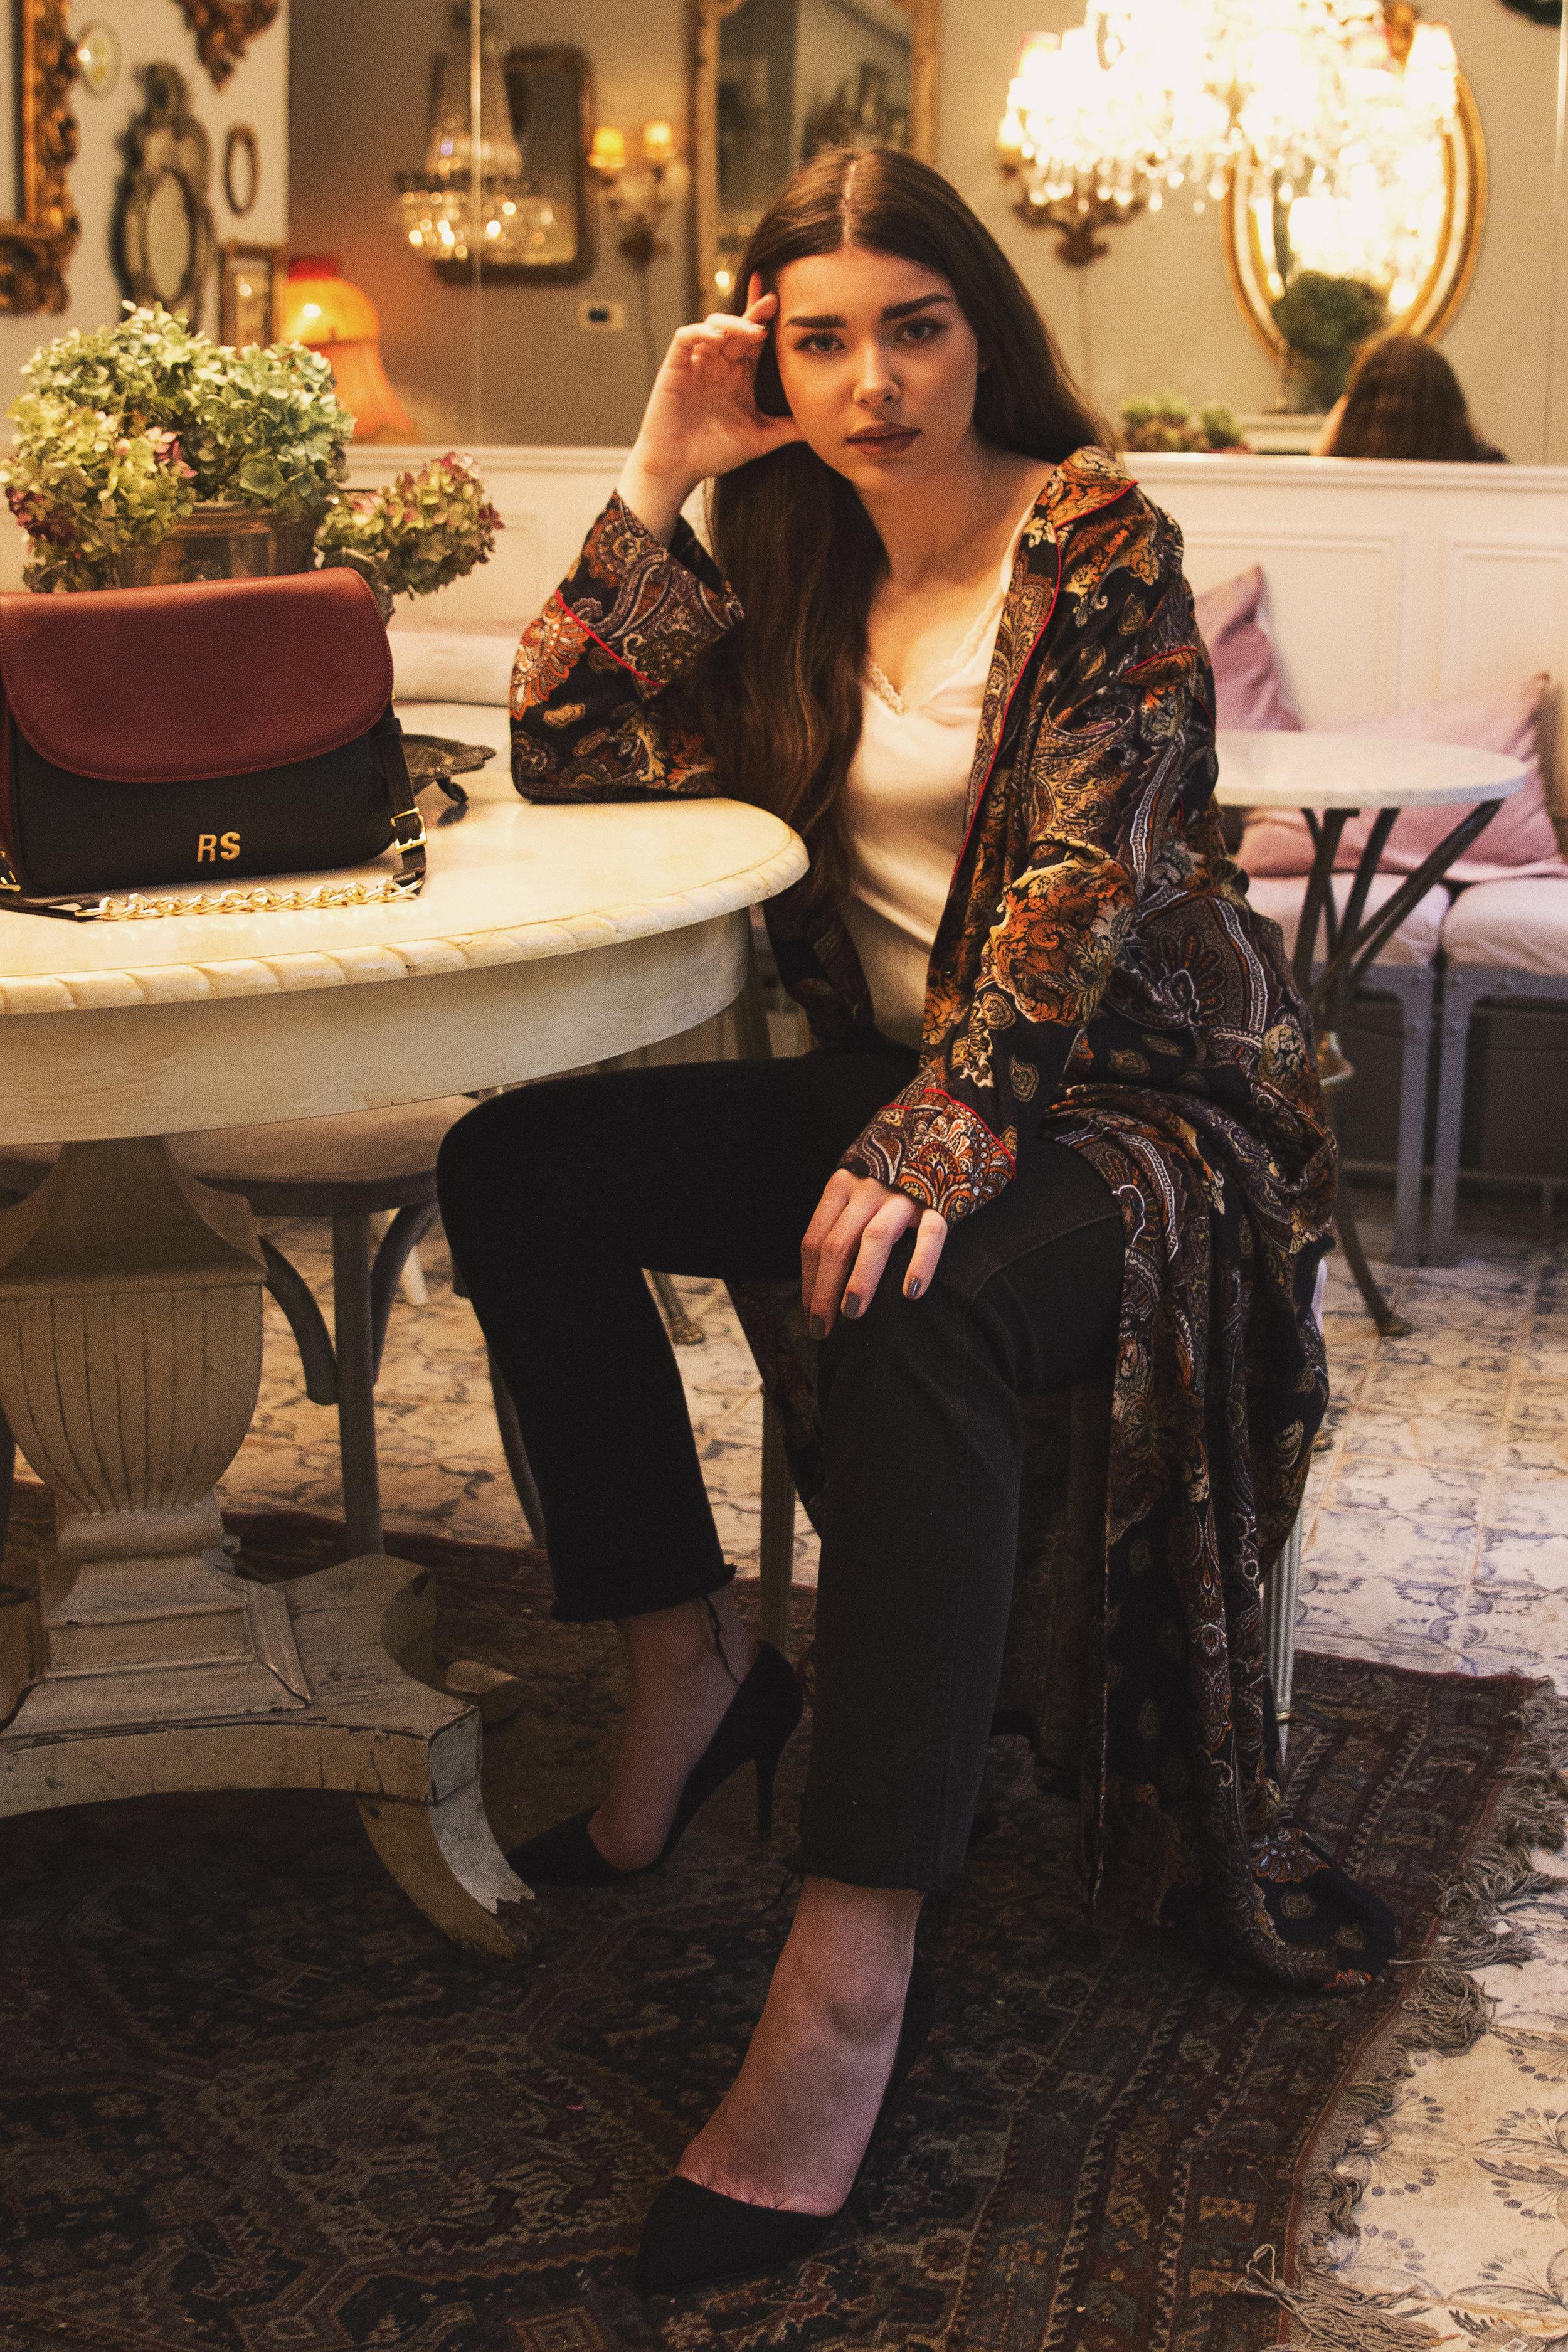 fashion-editorial-robert-sever-caffe-bar-finjak-expensive-reality-fashion-photography (10).jpg